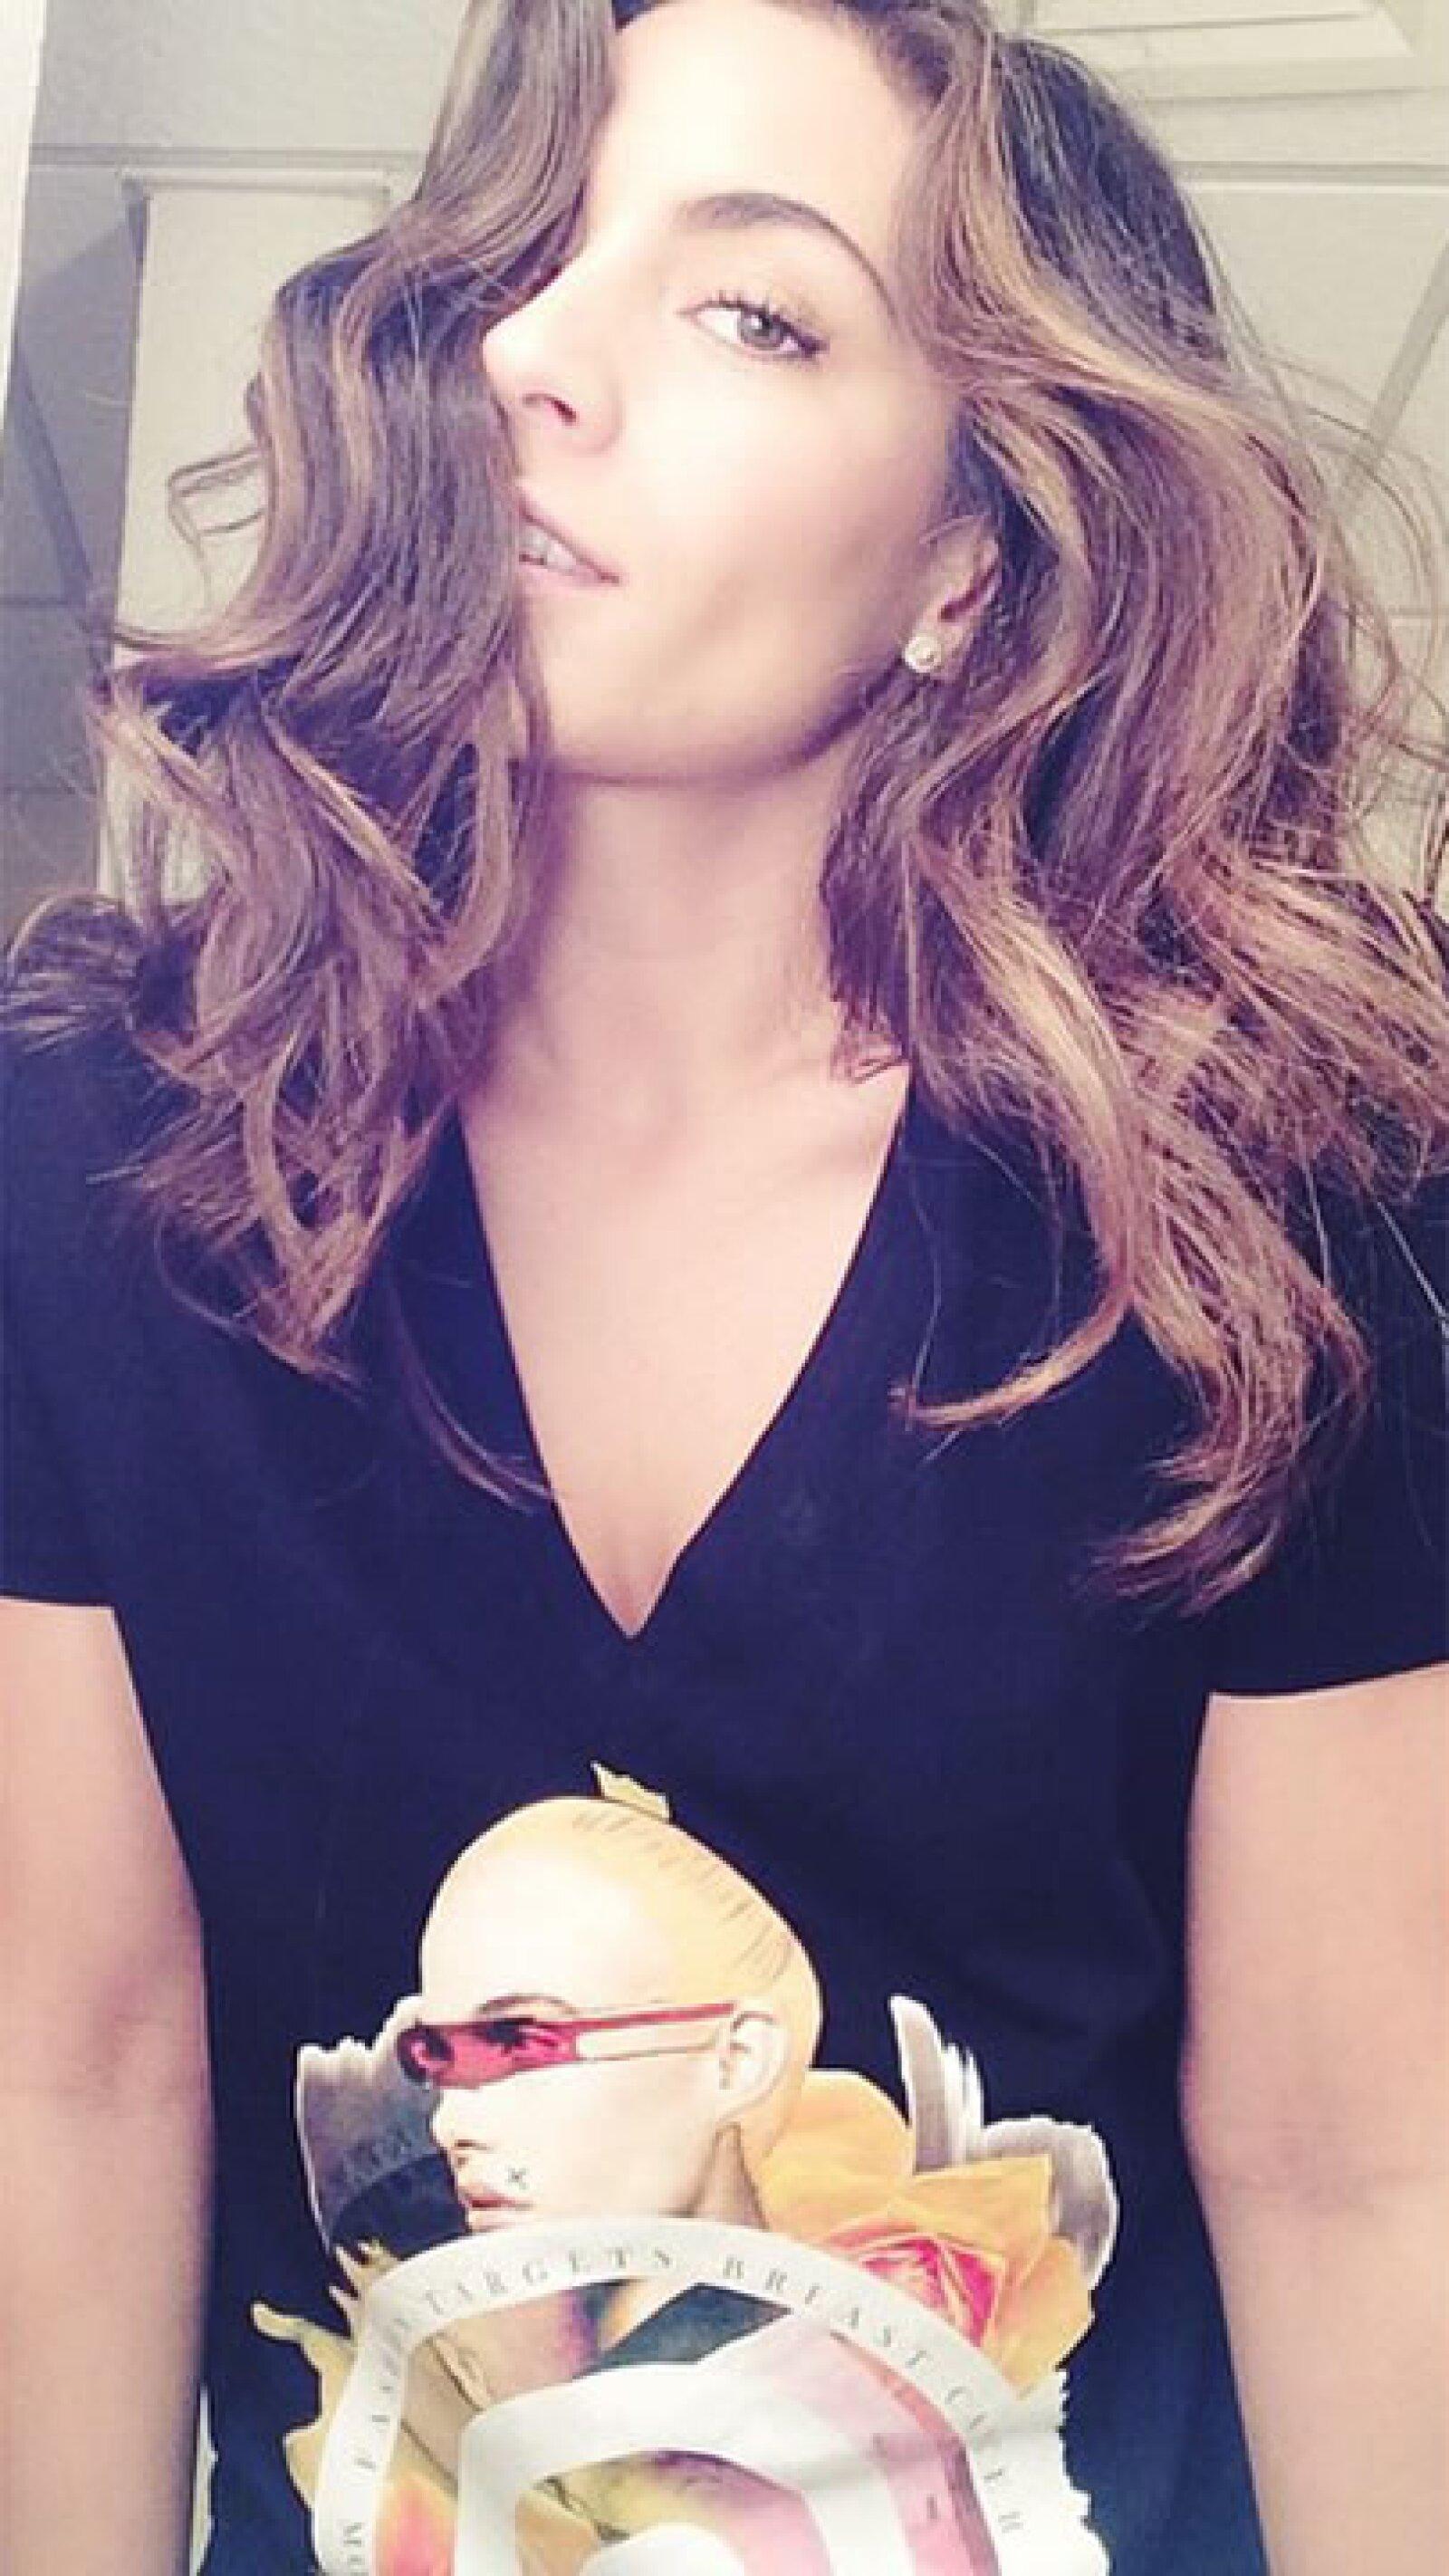 Ana Brenda contreras lució con mucho estilo su t-shirt con causa contra el cáncer de mama. `Fuck you cancer´escribió.